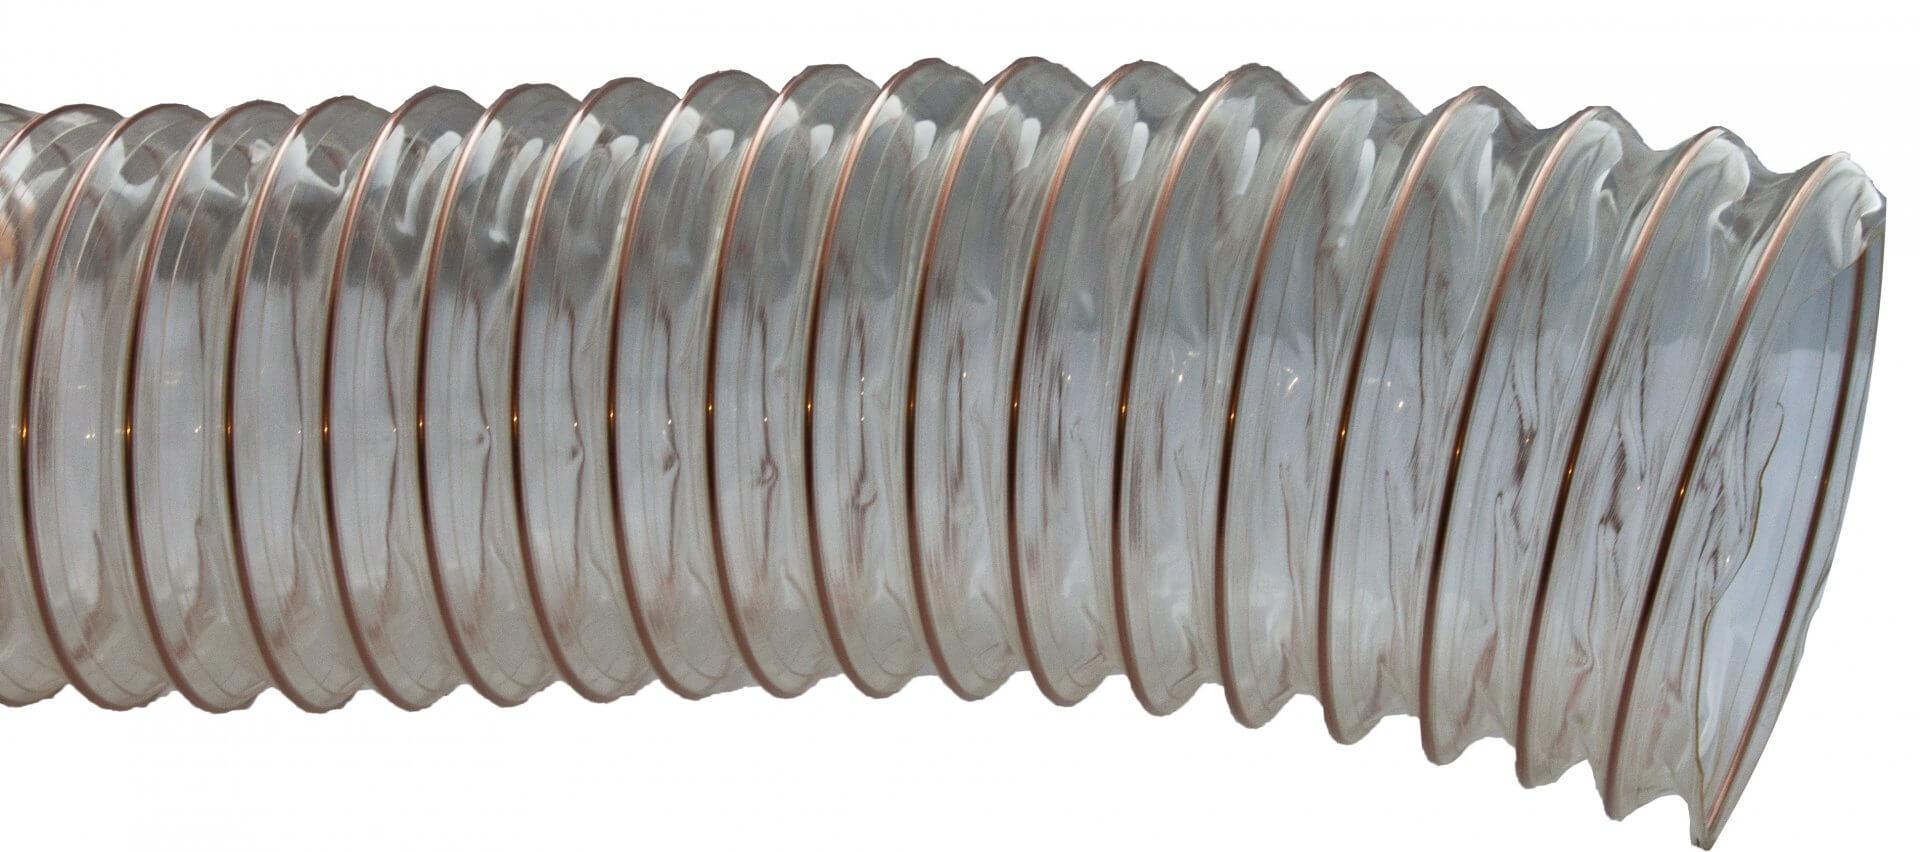 Puruletku P2PU 6m (koot 120-300 mm) - Kailatec Oy Verkkokauppa